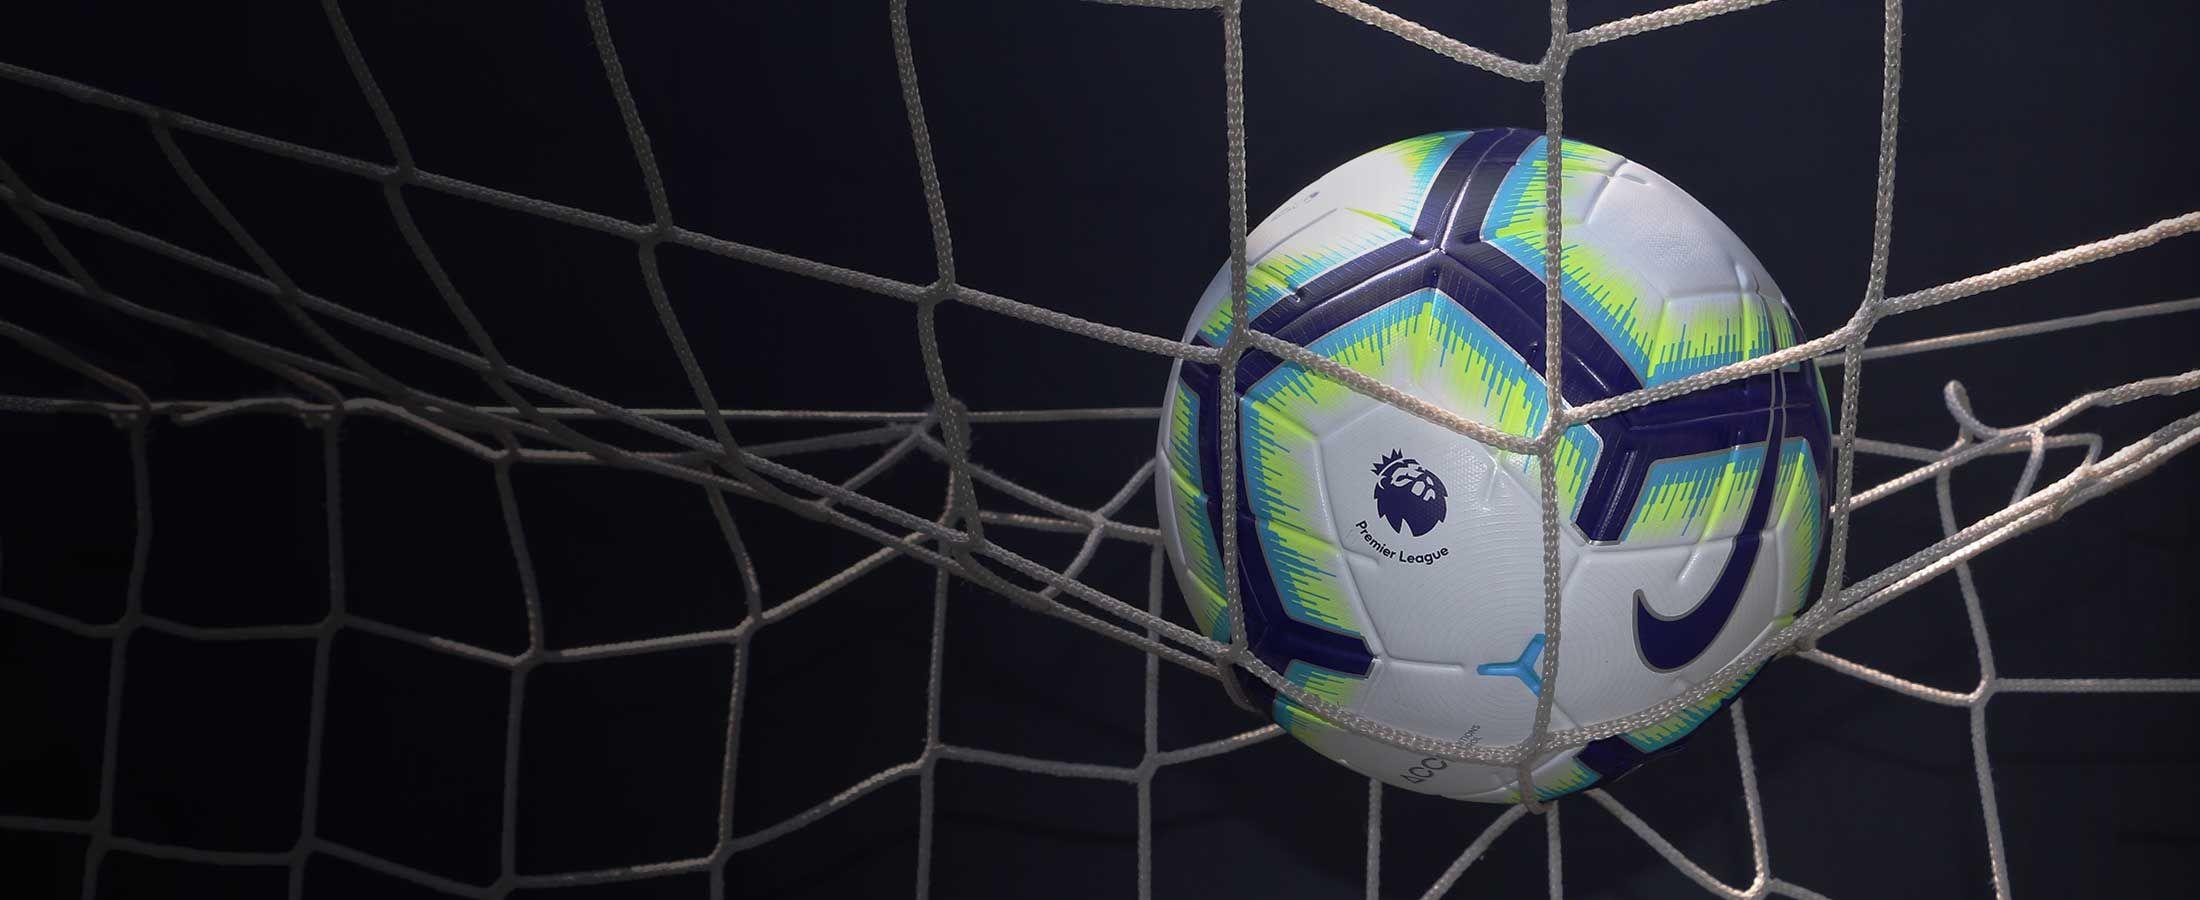 Balón de fútbol Nike para la Premier League 2018 - 2019 talla 5 - blanco   371c062d82cd2